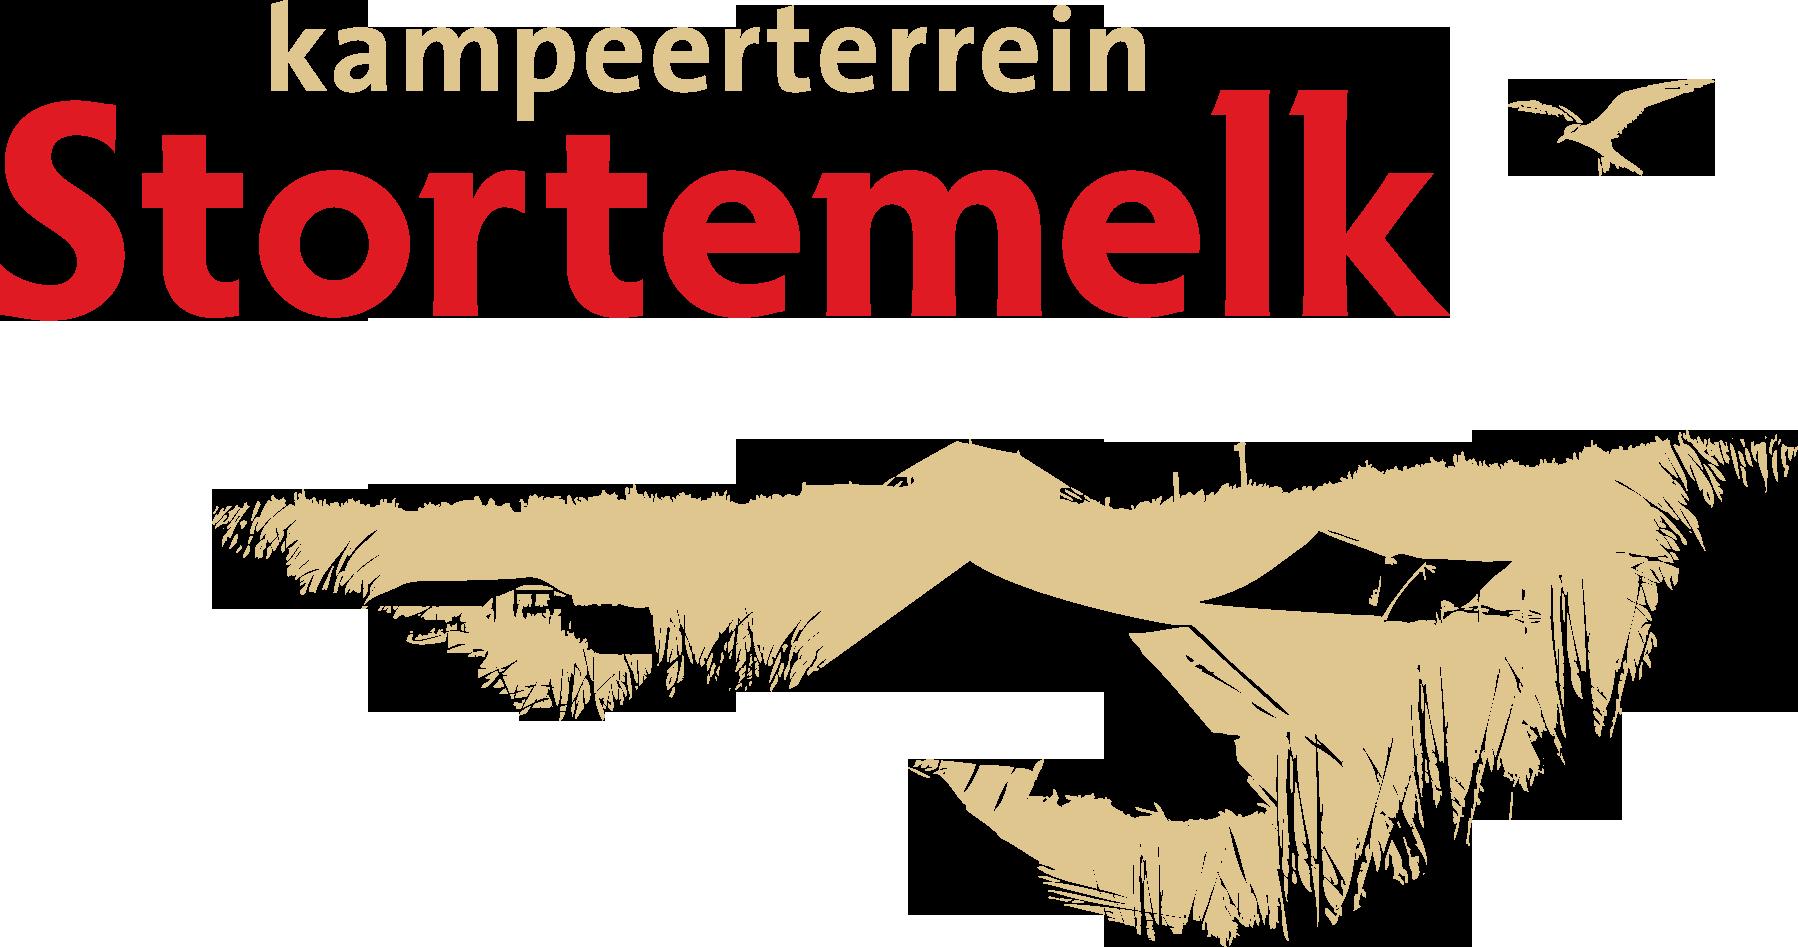 Kampeerterrein Stortemelk Advertentie